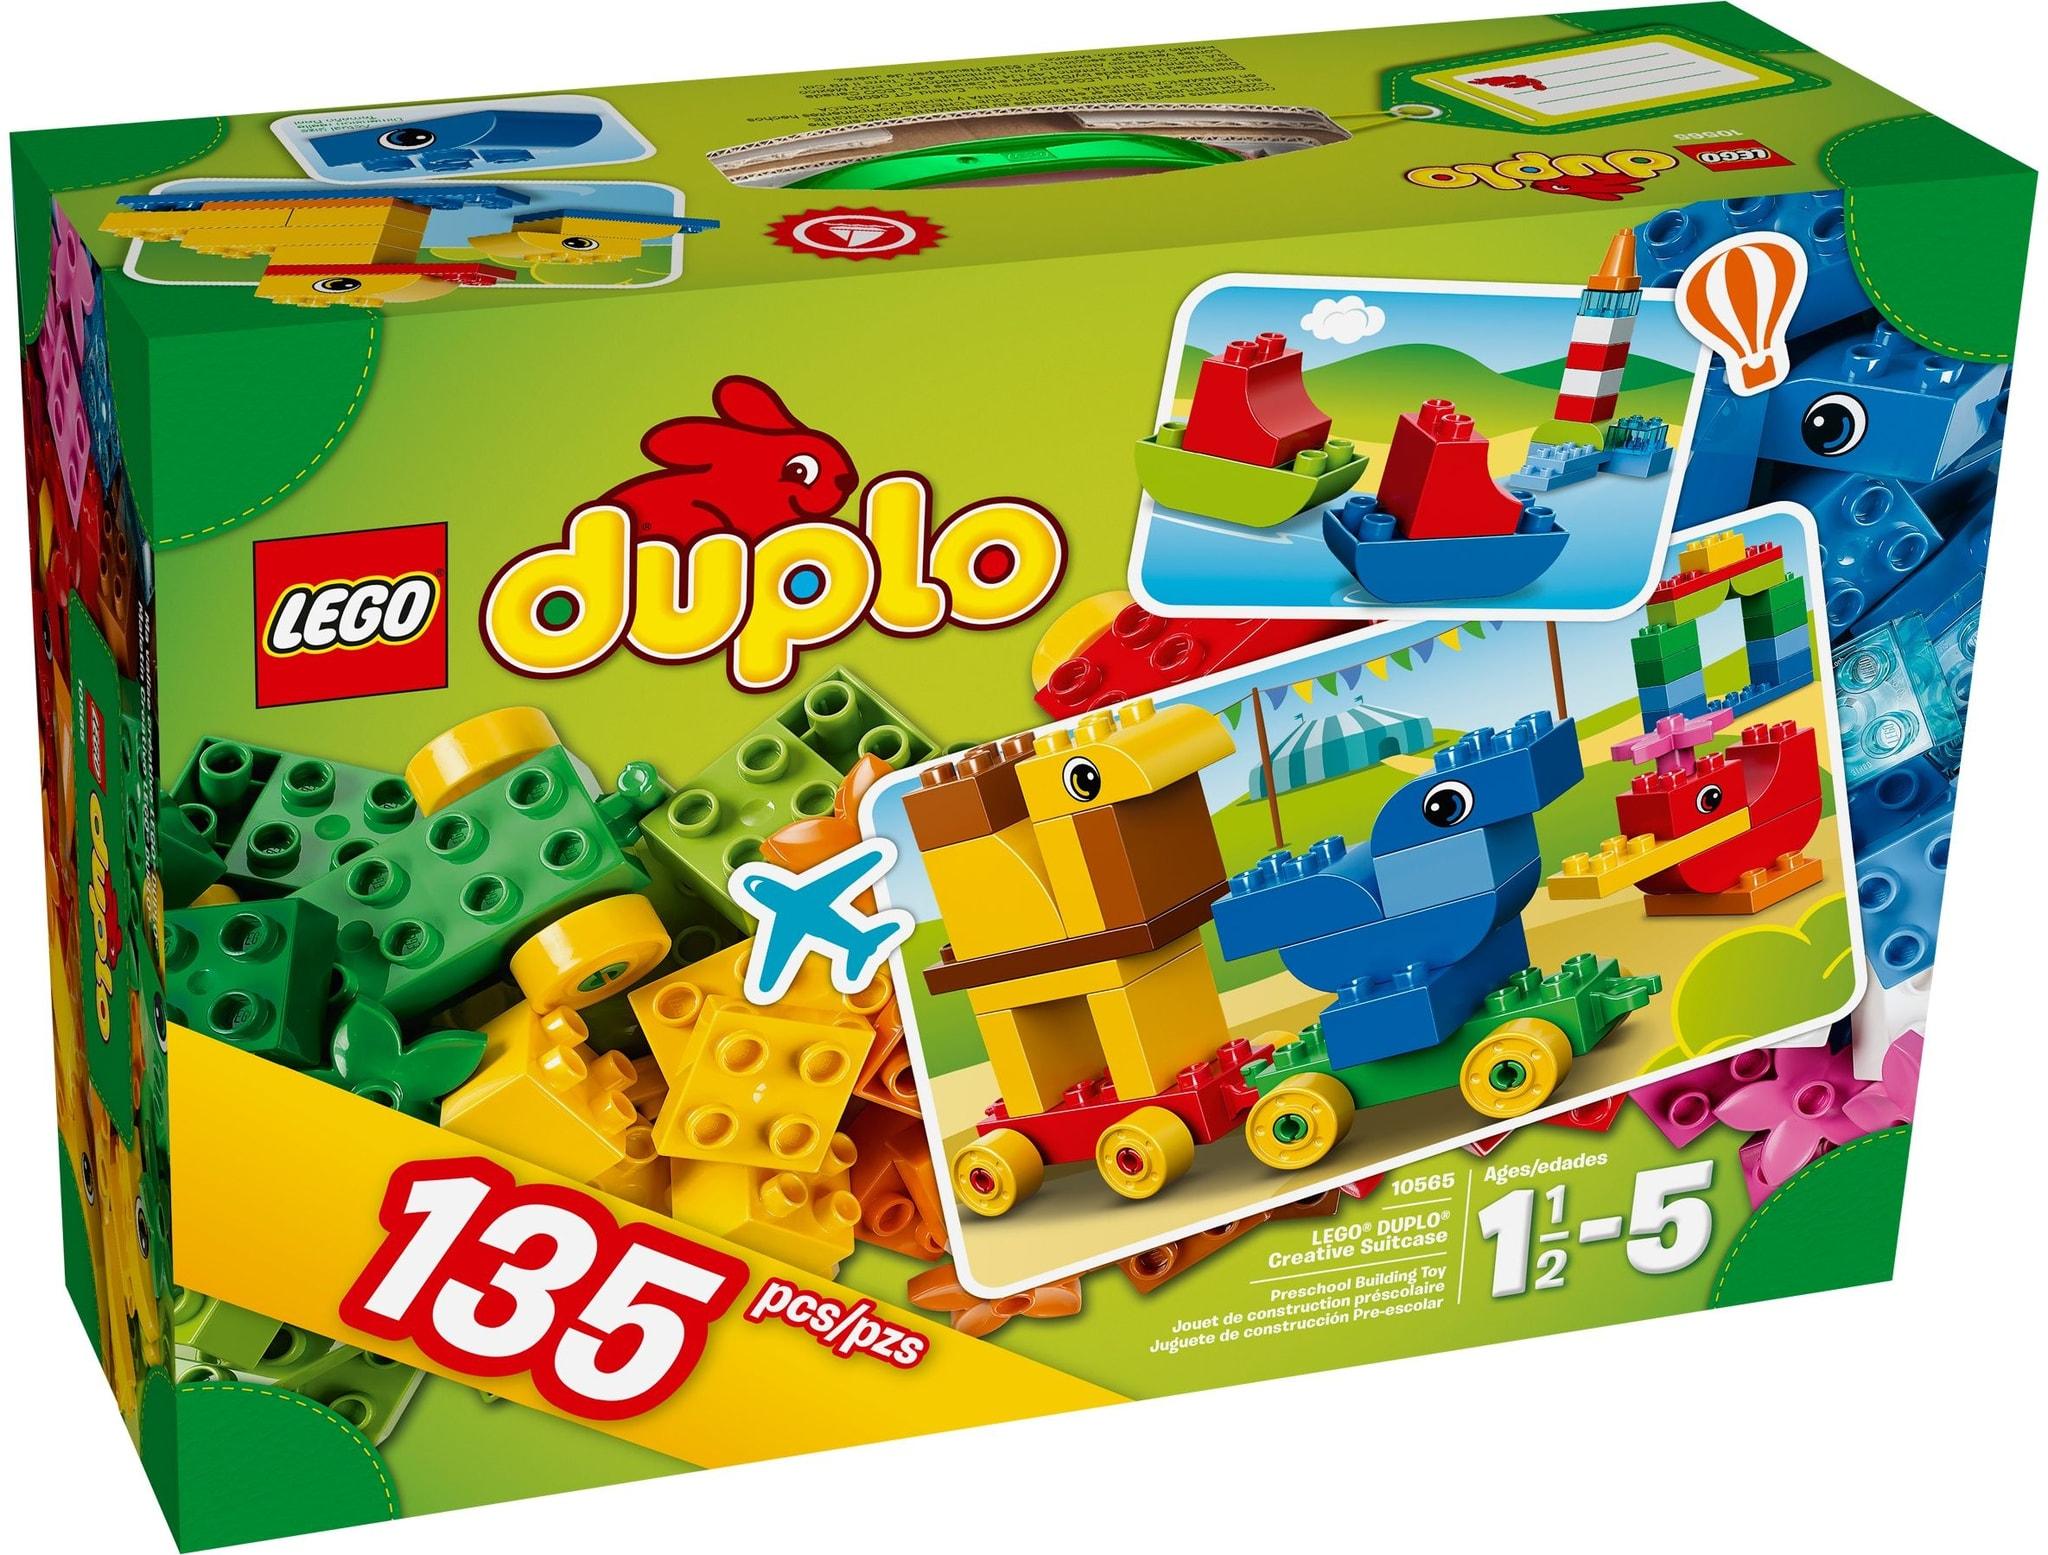 LEGO 10565 - Duplo - Creative Suitcase